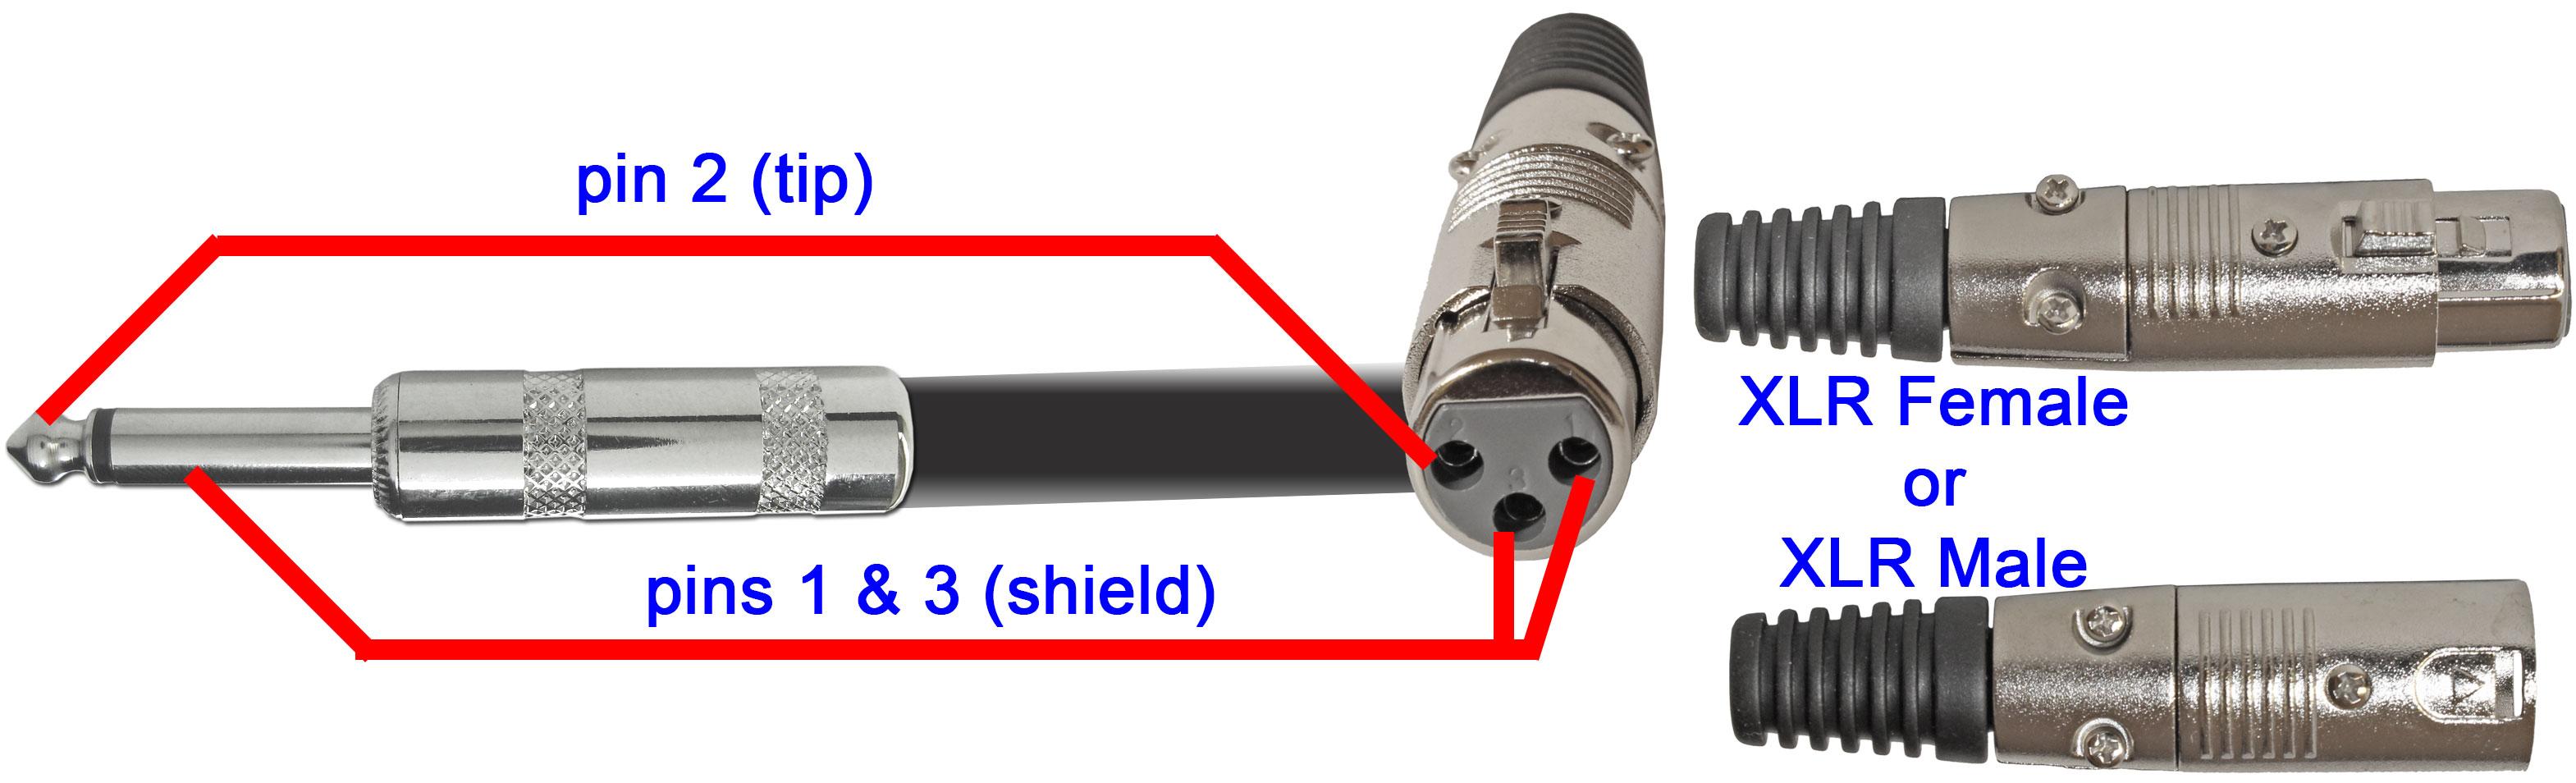 Balanced Vs Unbalanced Cables Faq S Advance Mcs Electronics